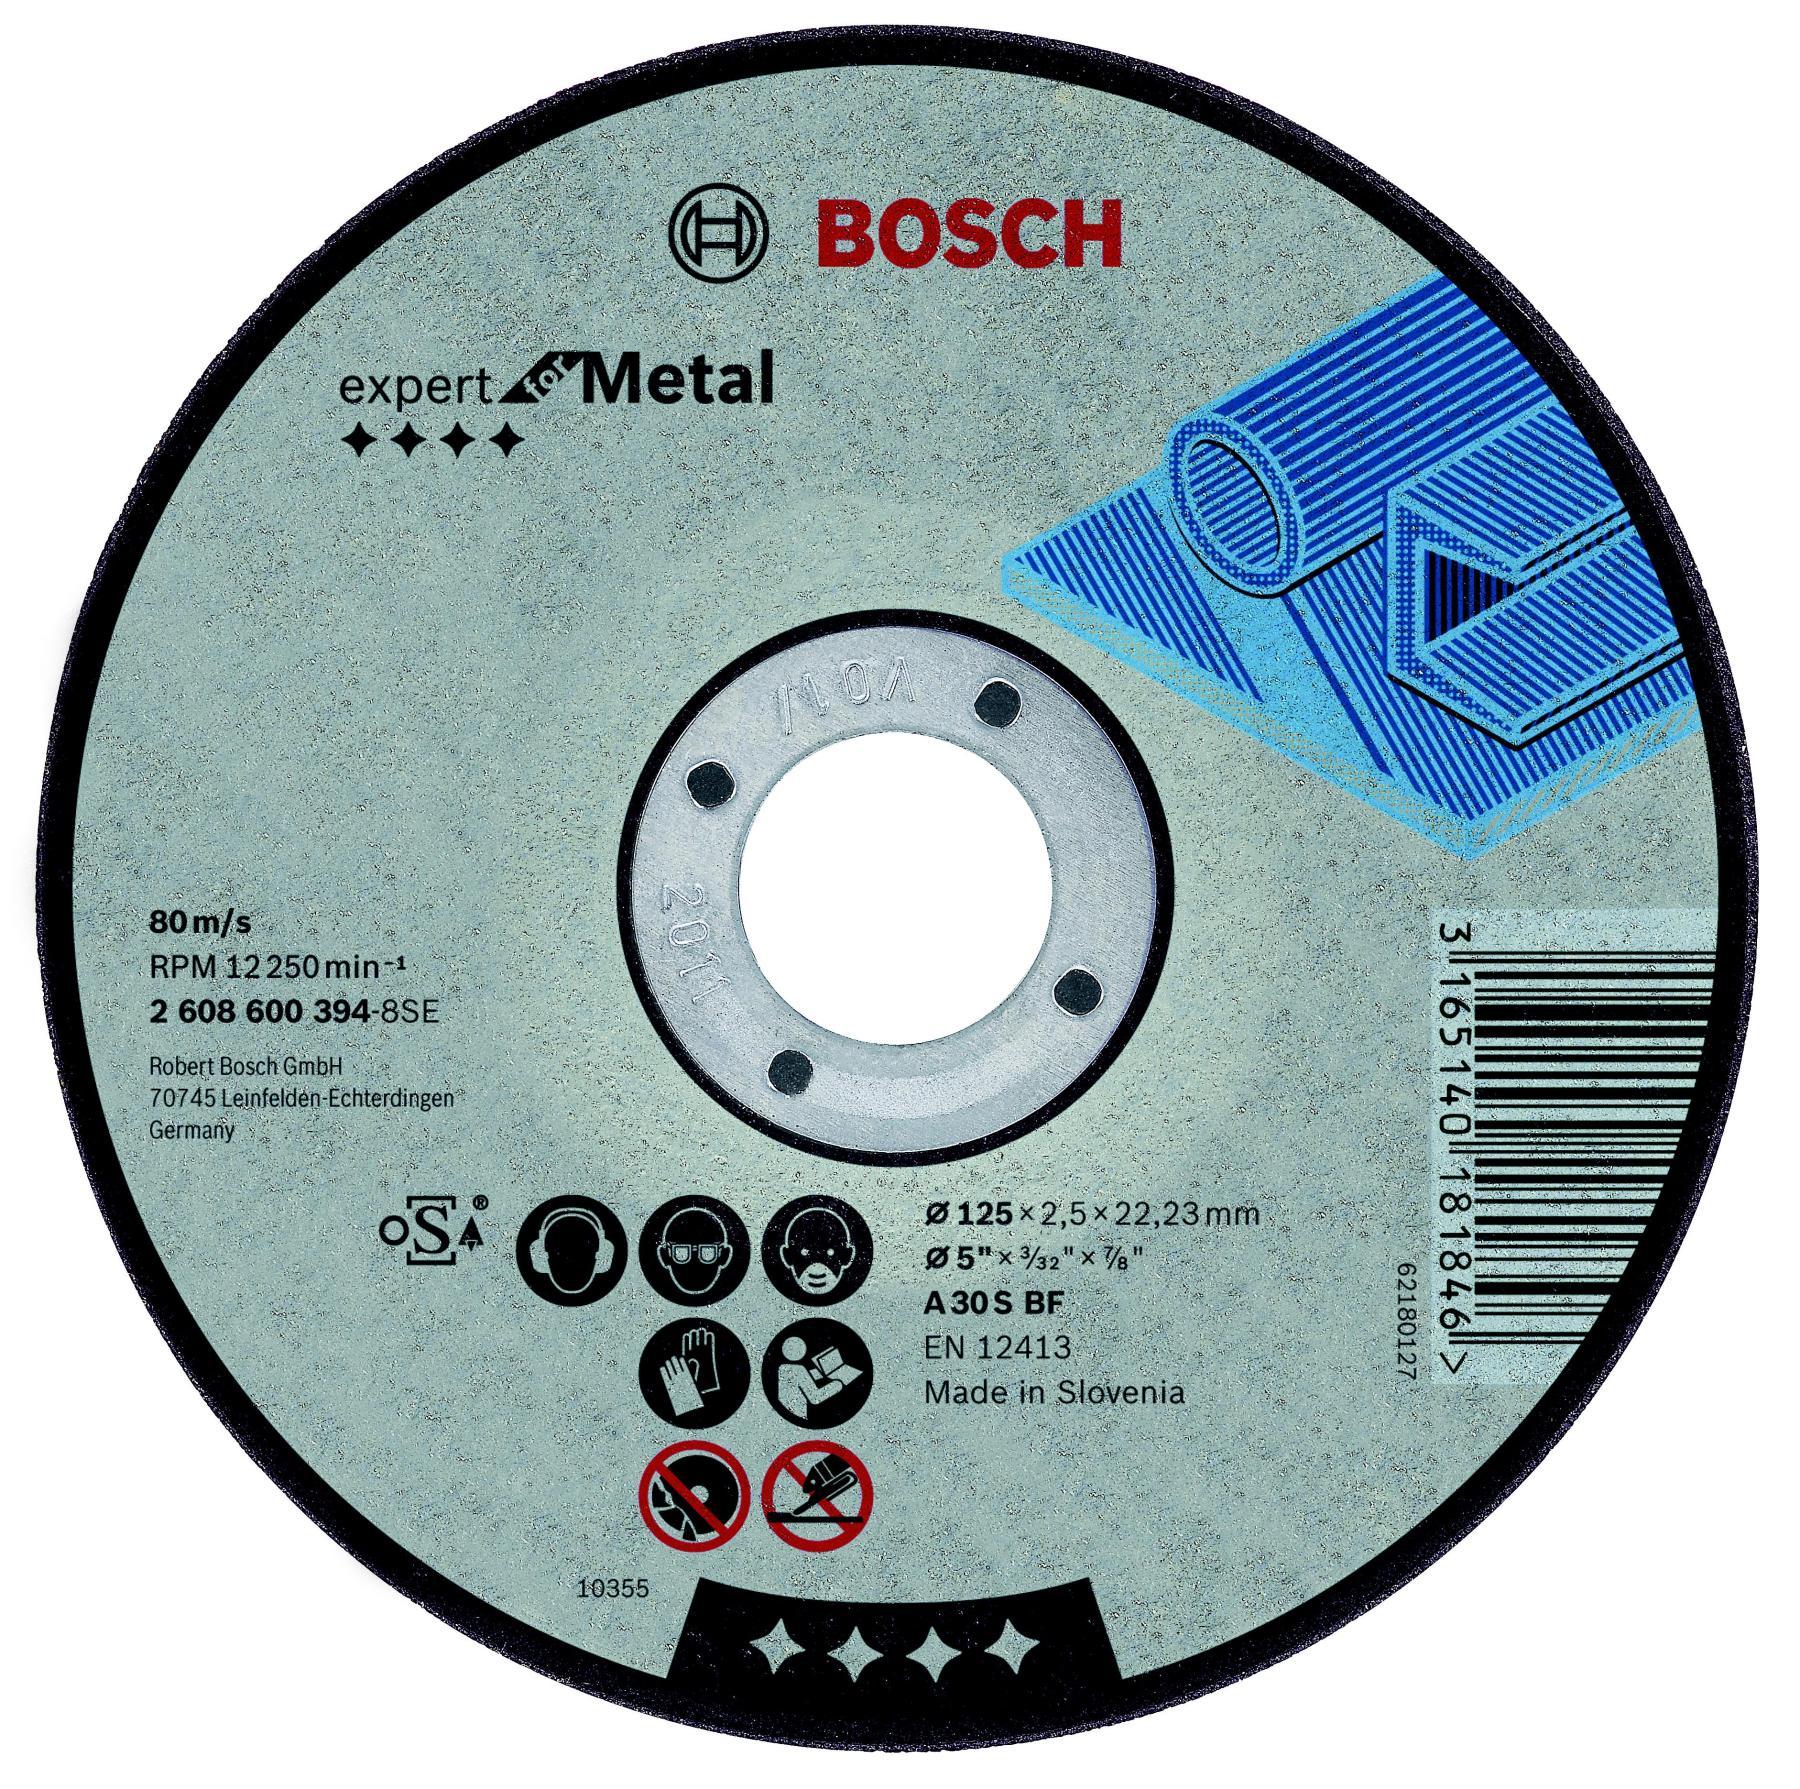 Circle Cutting BOSCH 115х1. 6x22 Expert For Metal (2.608.600.214)